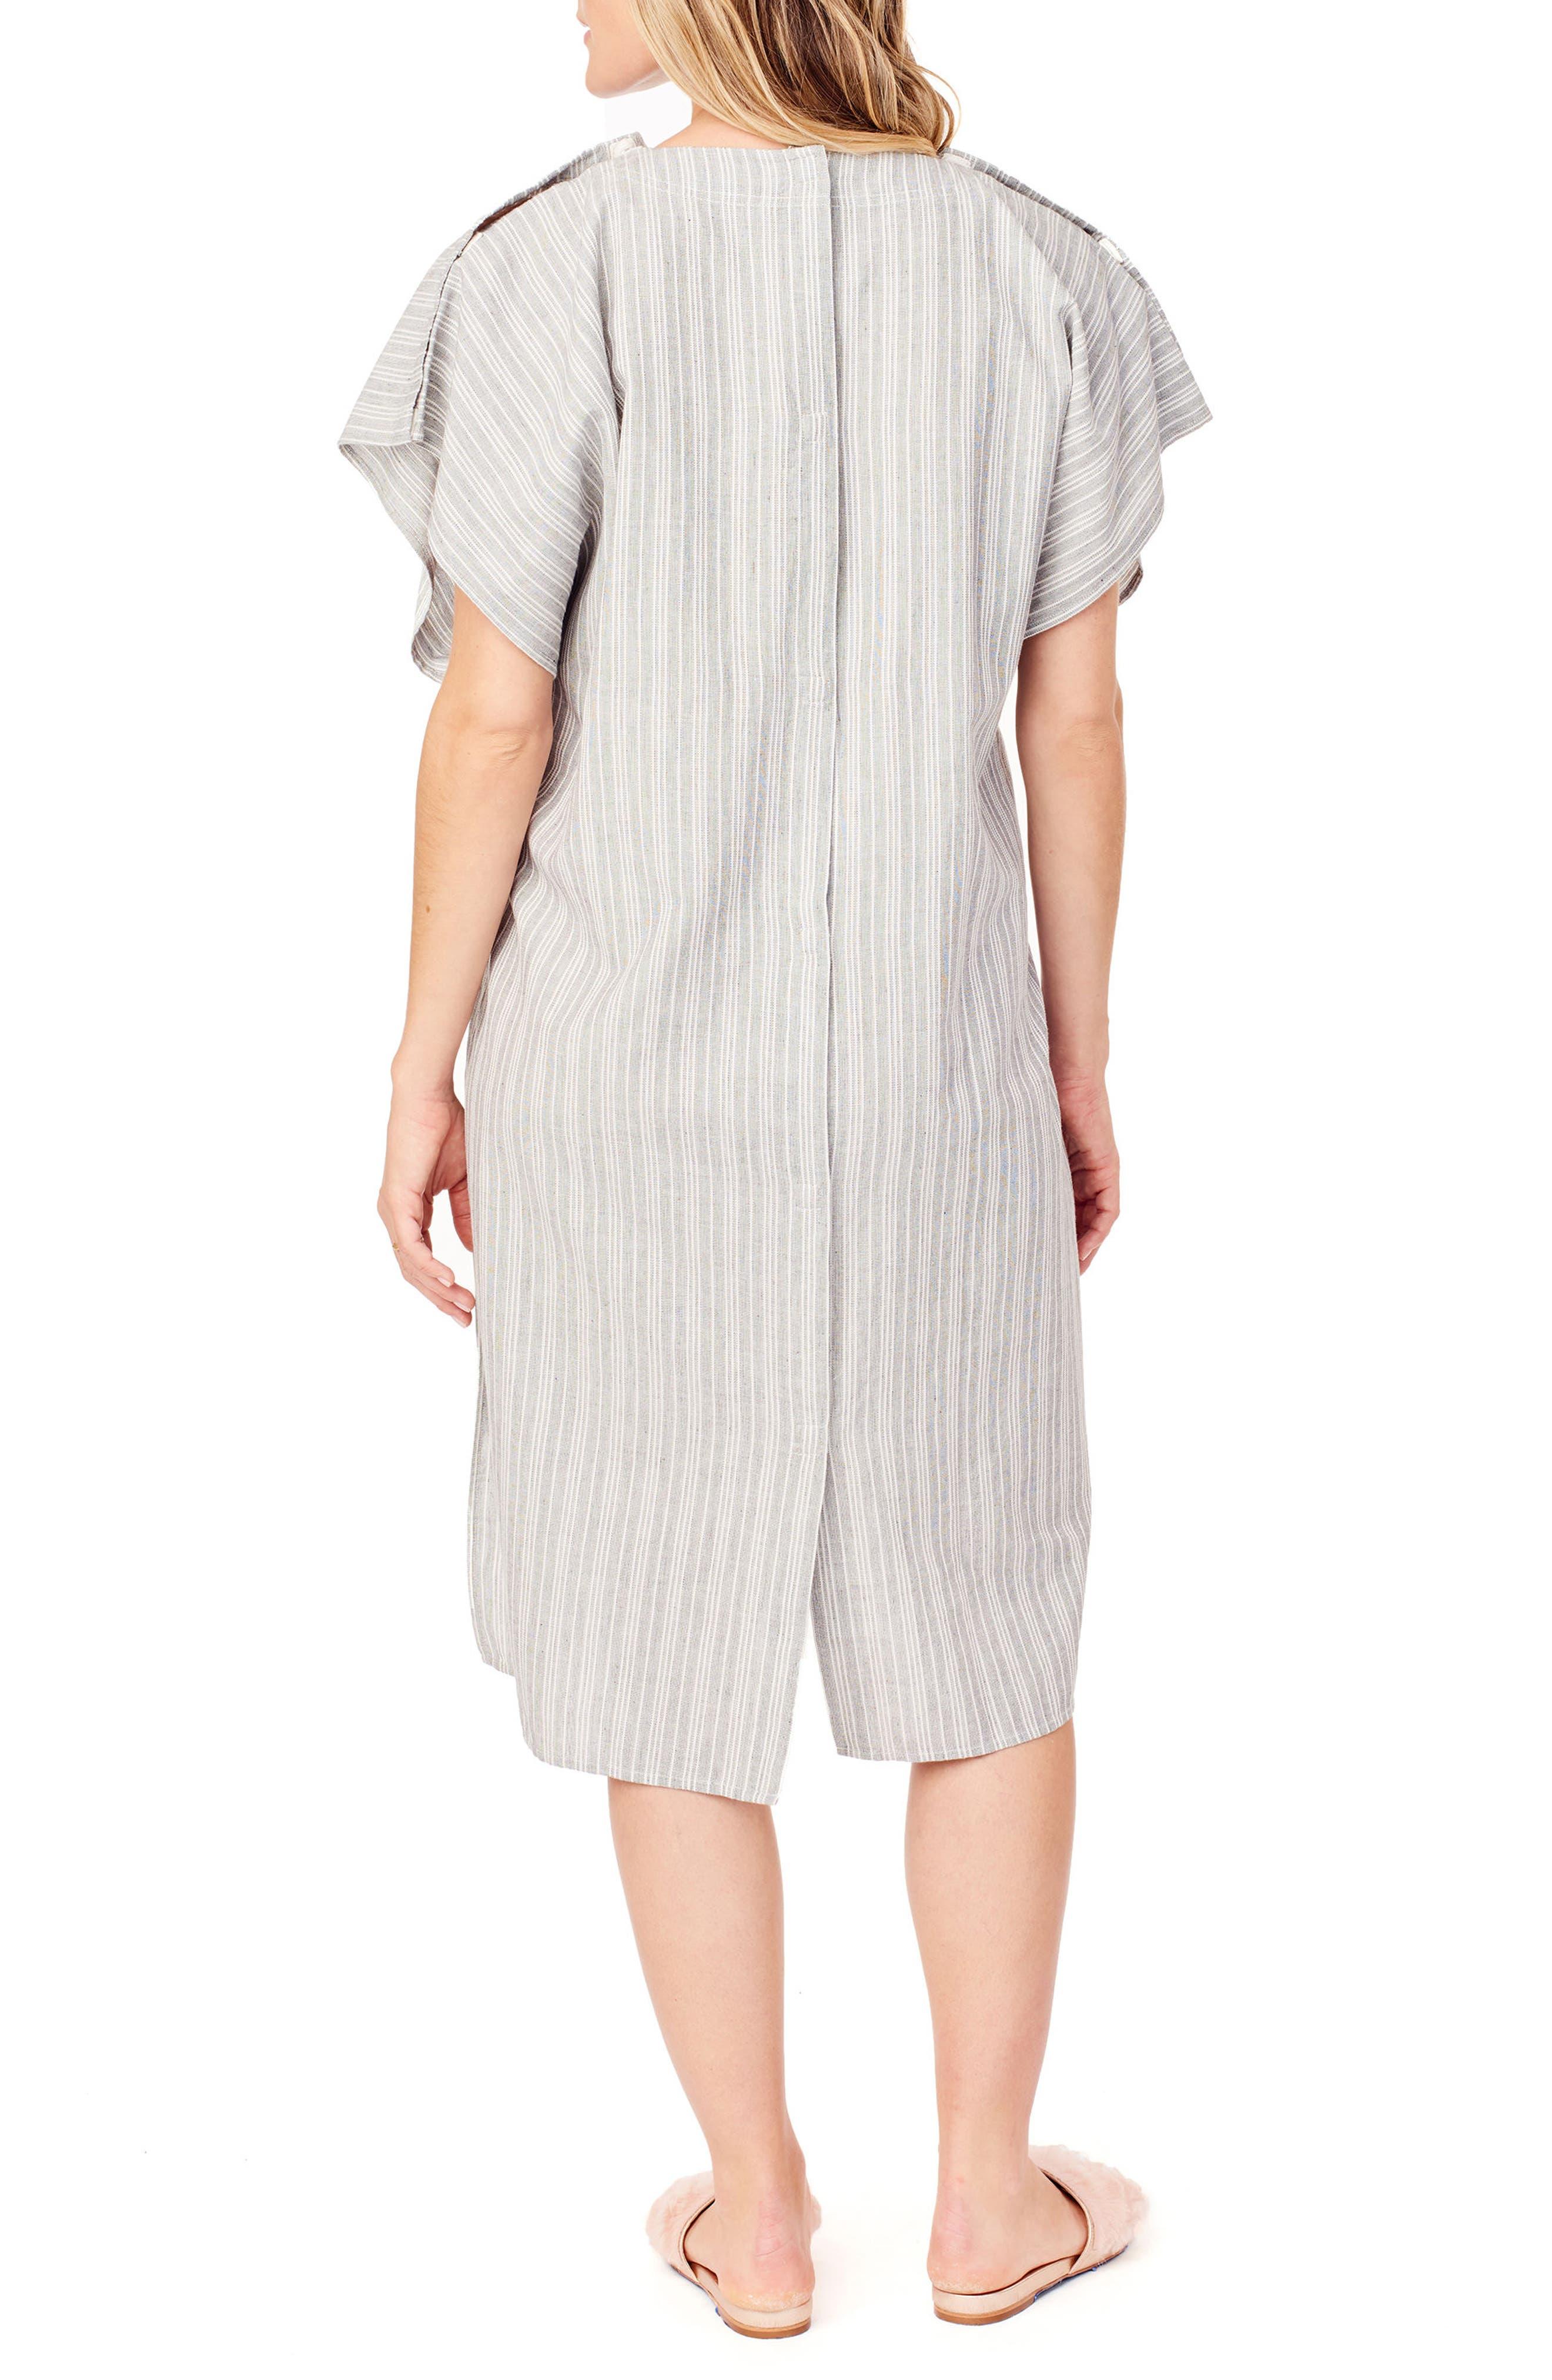 x James Fox & Co. Maternity/Nursing Hospital Gown,                             Alternate thumbnail 2, color,                             BLACK/ WHITE DOBBY STRIPE